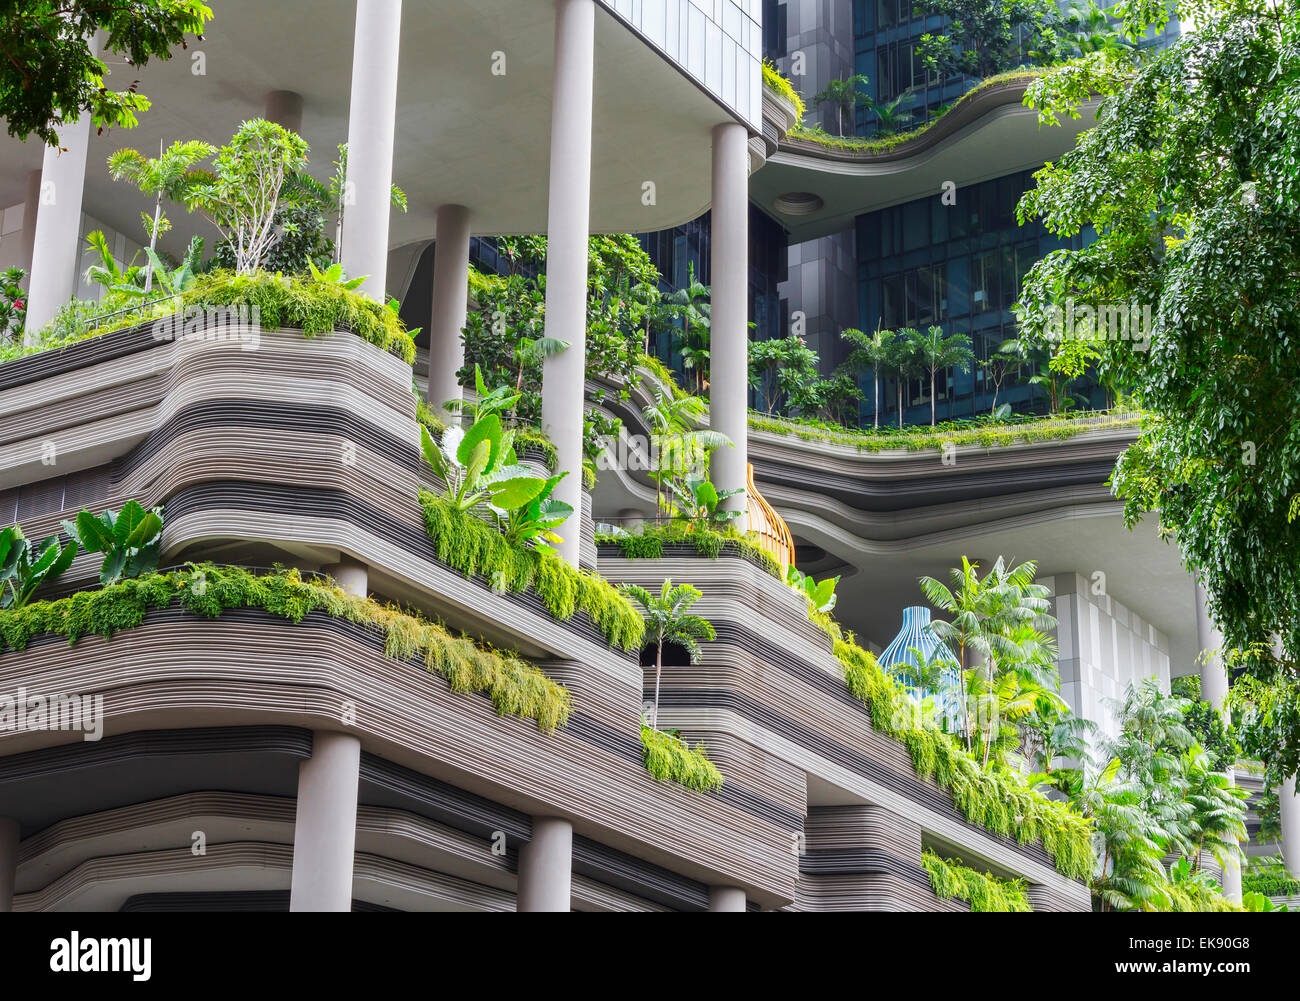 Hôtel avec un balcon luxuriante Photo Stock